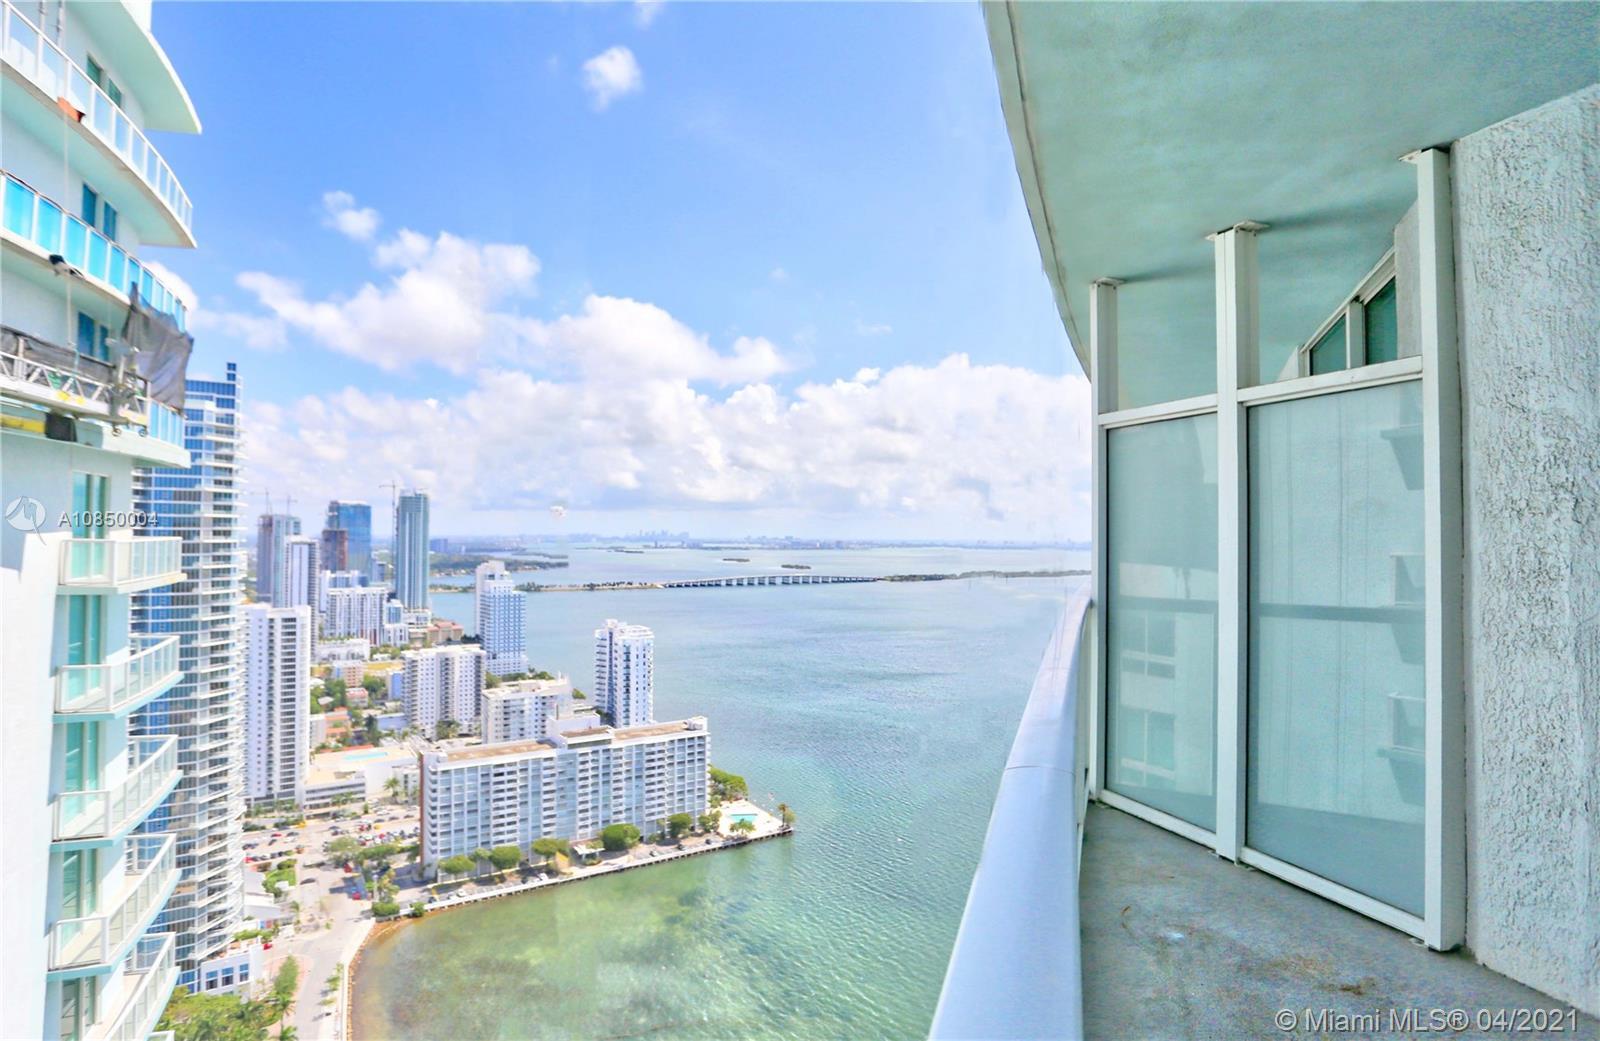 1900 N Bayshore Dr # 4110, Miami, Florida 33132, 1 Bedroom Bedrooms, ,1 BathroomBathrooms,Residential,For Sale,1900 N Bayshore Dr # 4110,A10850004